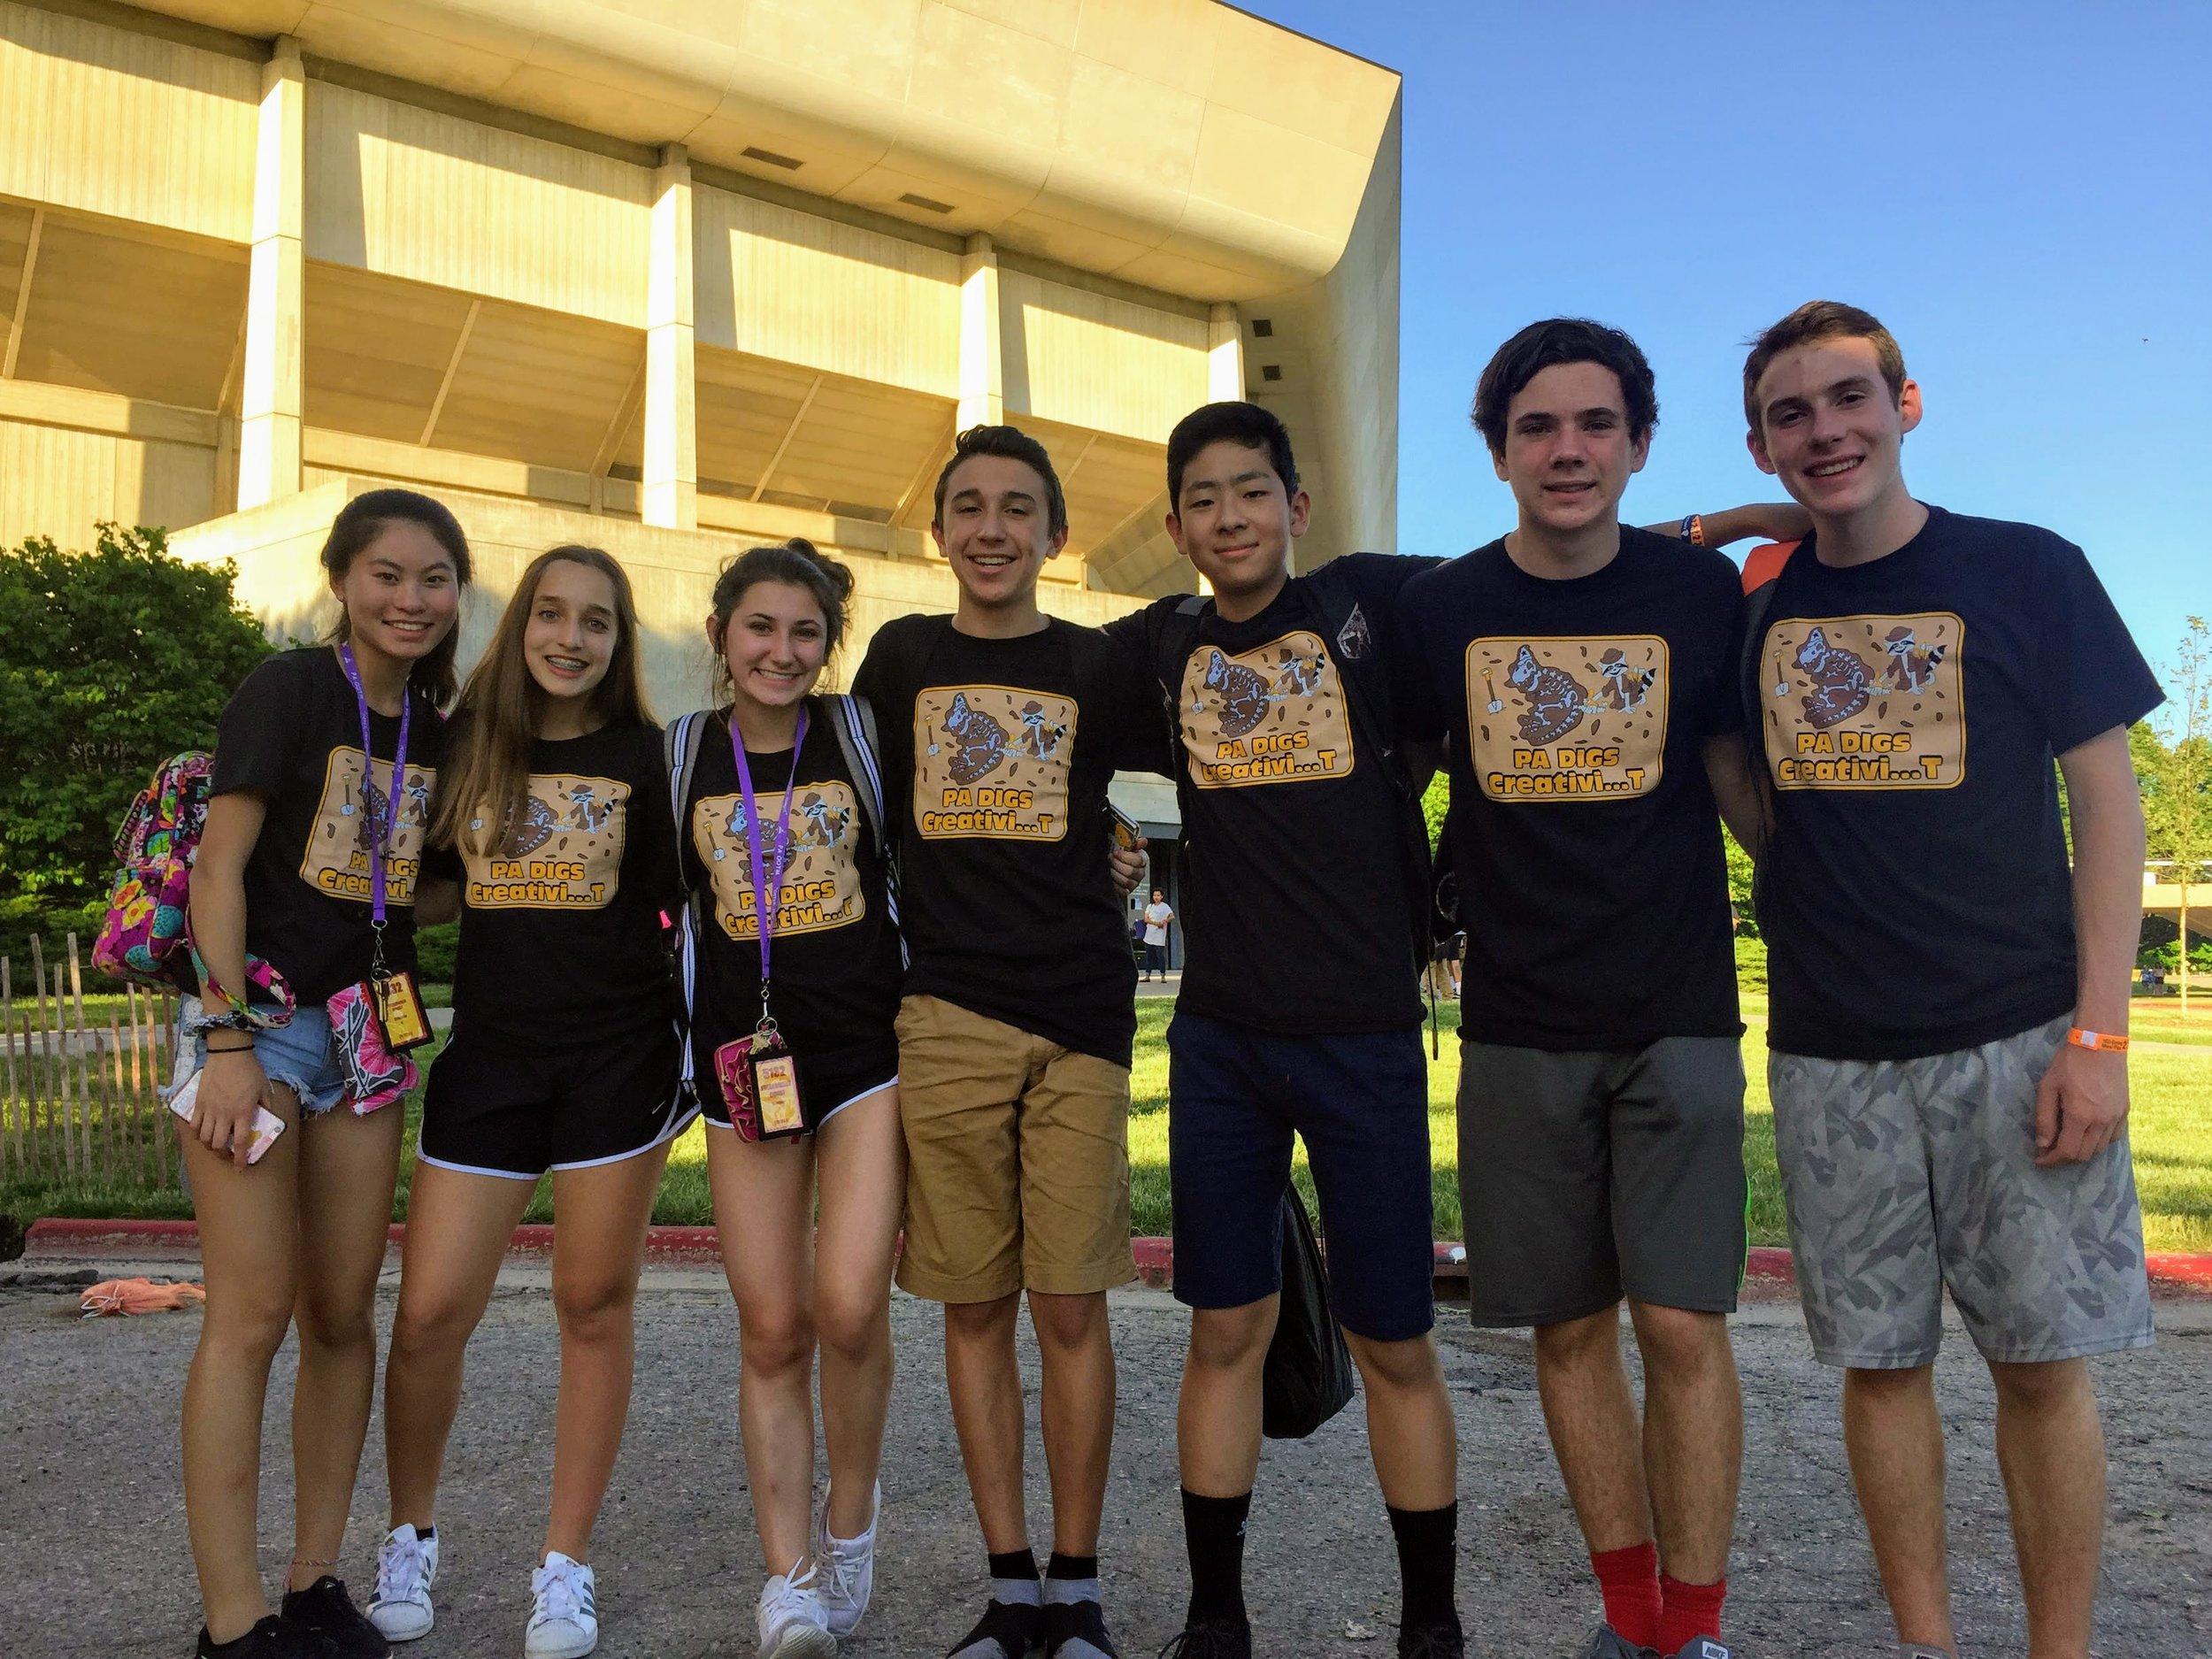 USCHS - 7th place P3/D3